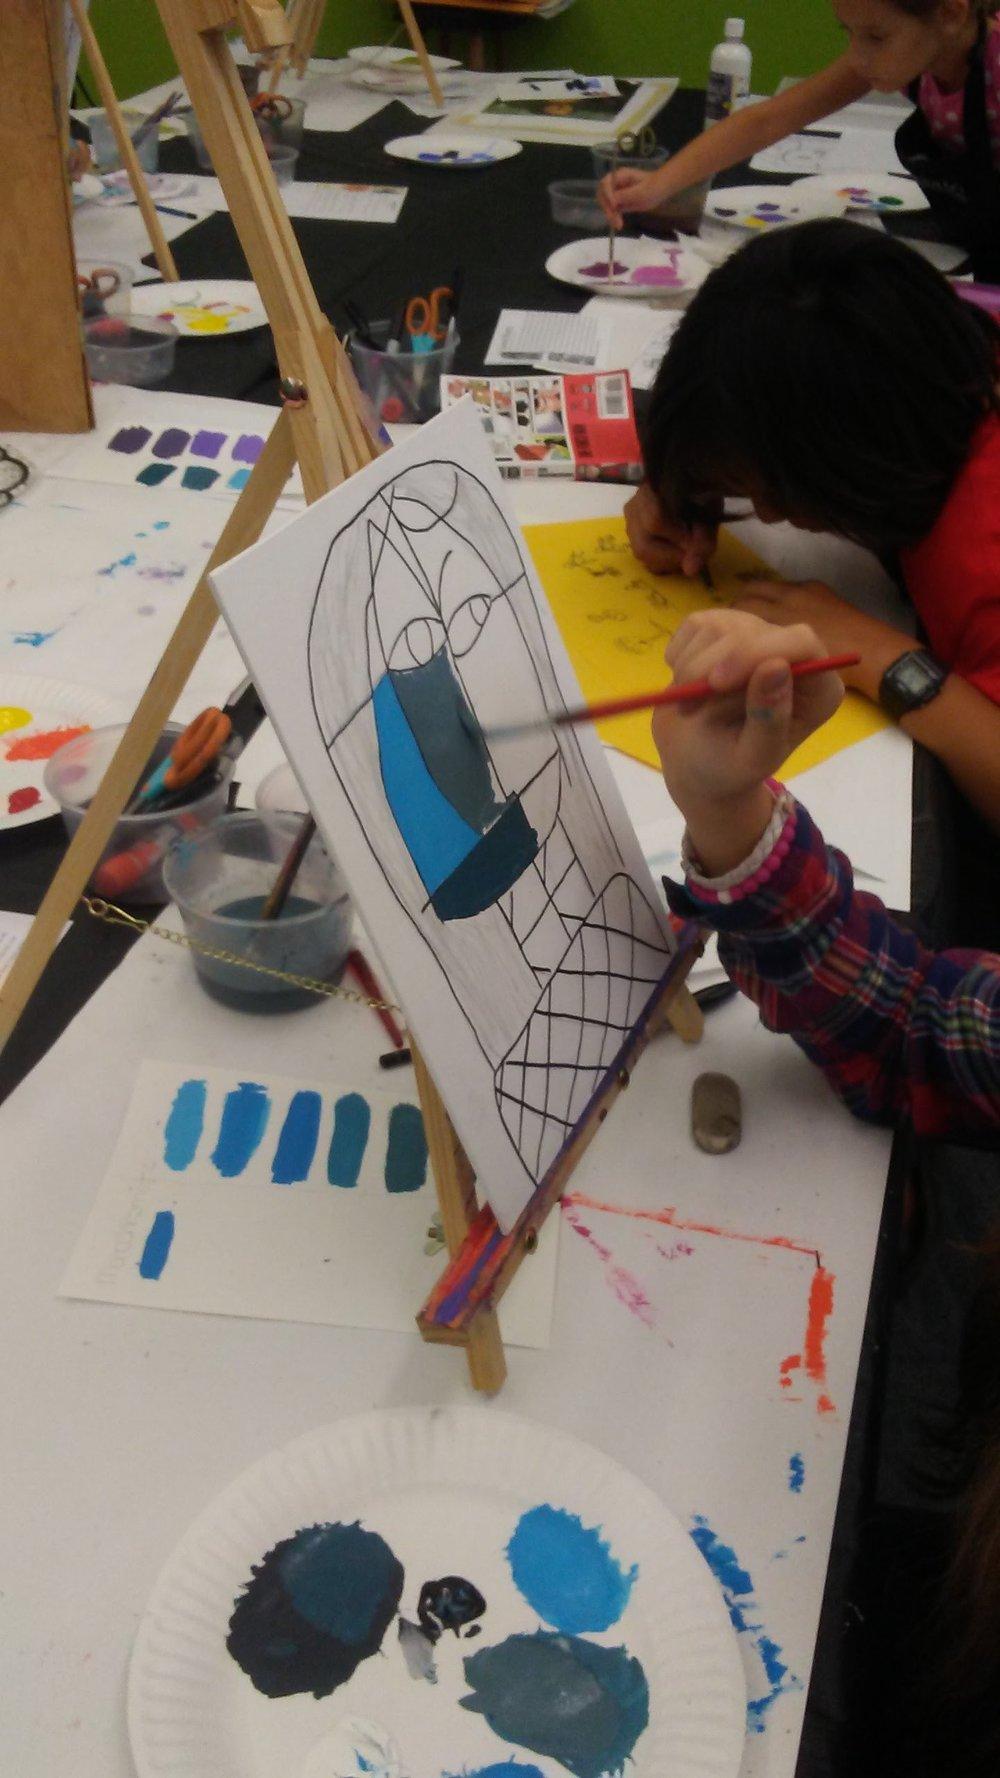 Klee inspired self-portraits.